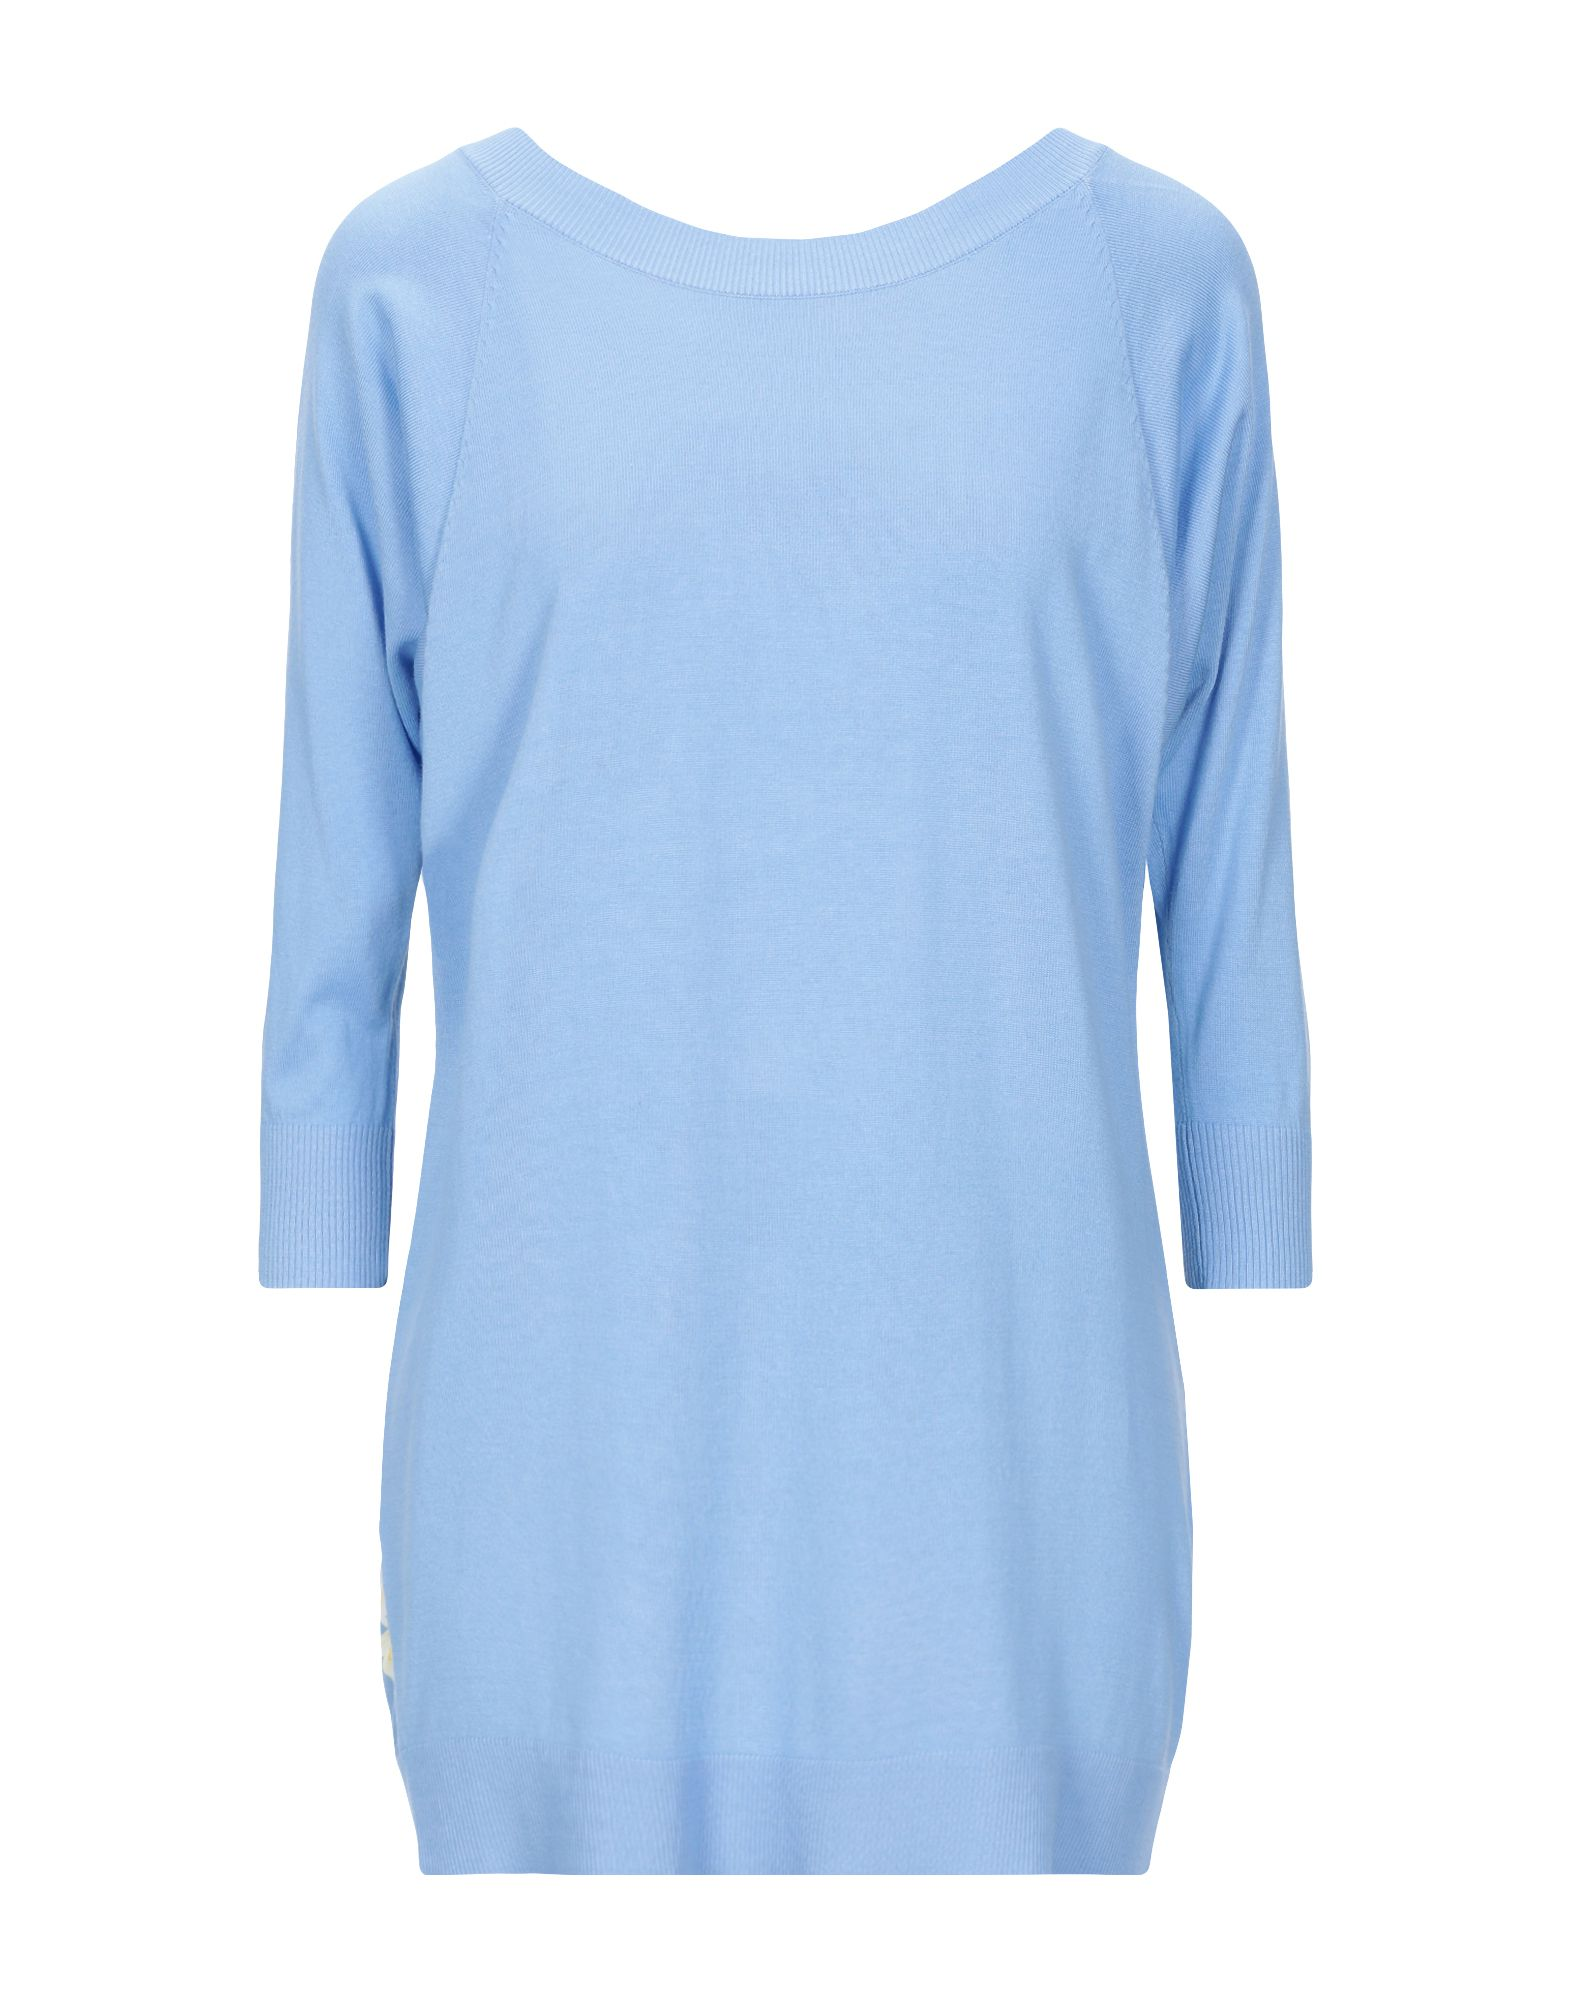 TWINSET Sweaters - Item 39834497